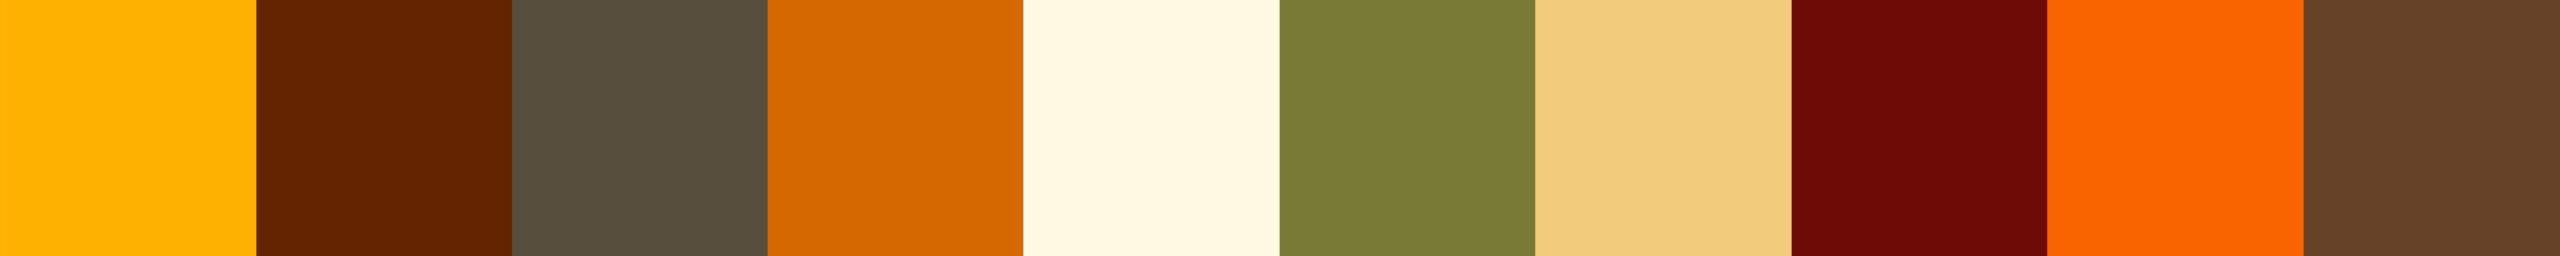 286 Alycra Color Palette